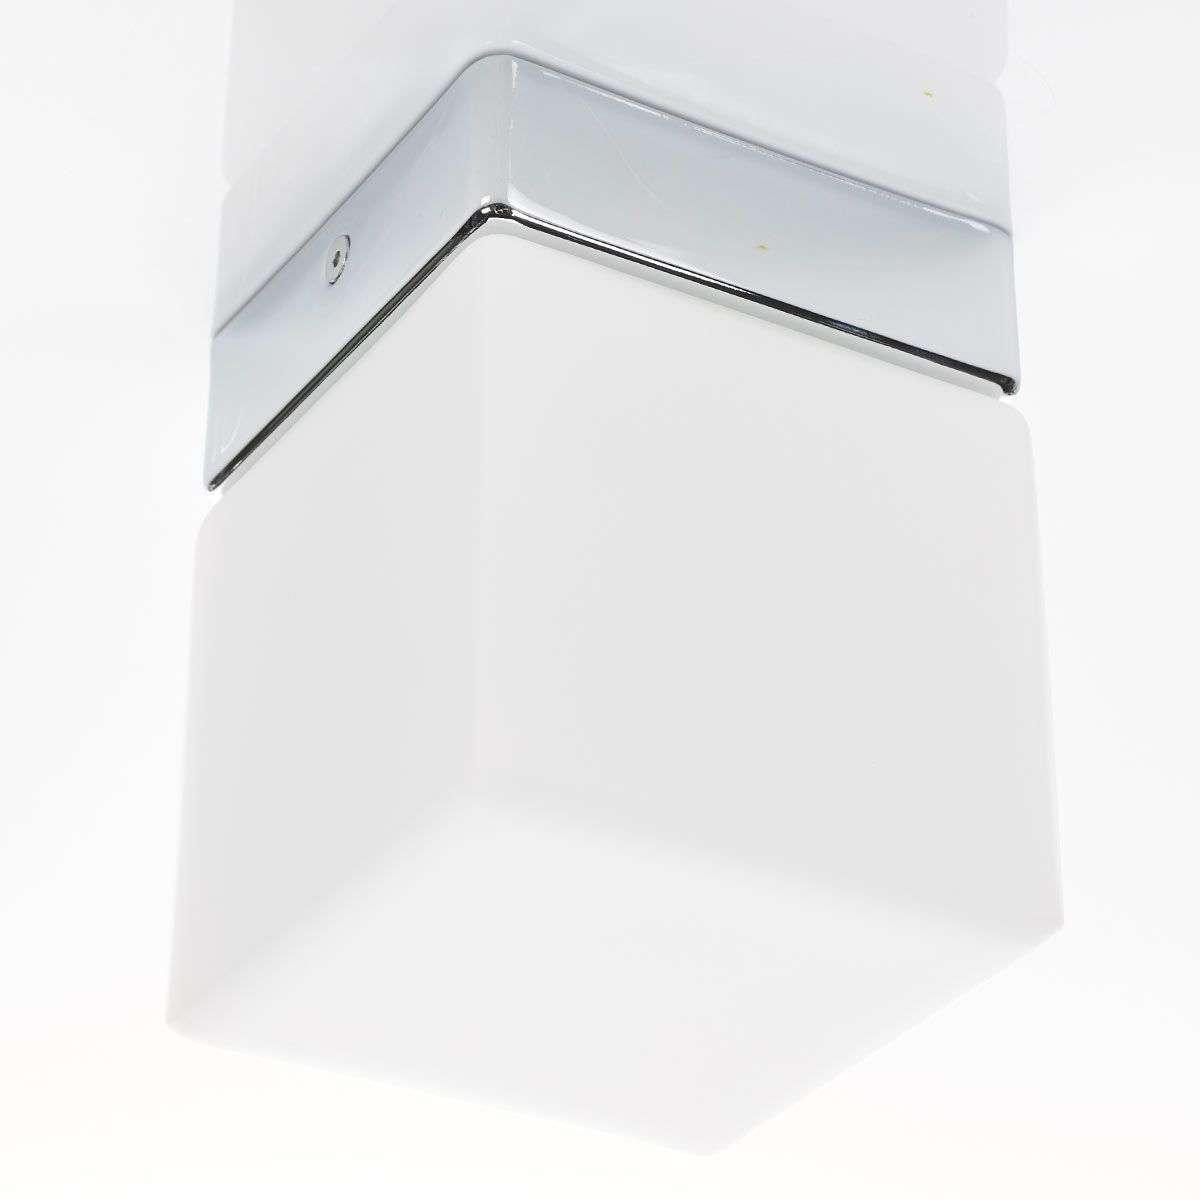 Cube shaped led bathroom ceiling light keto lights cube shaped led bathroom ceiling light keto 4516976 31 aloadofball Choice Image